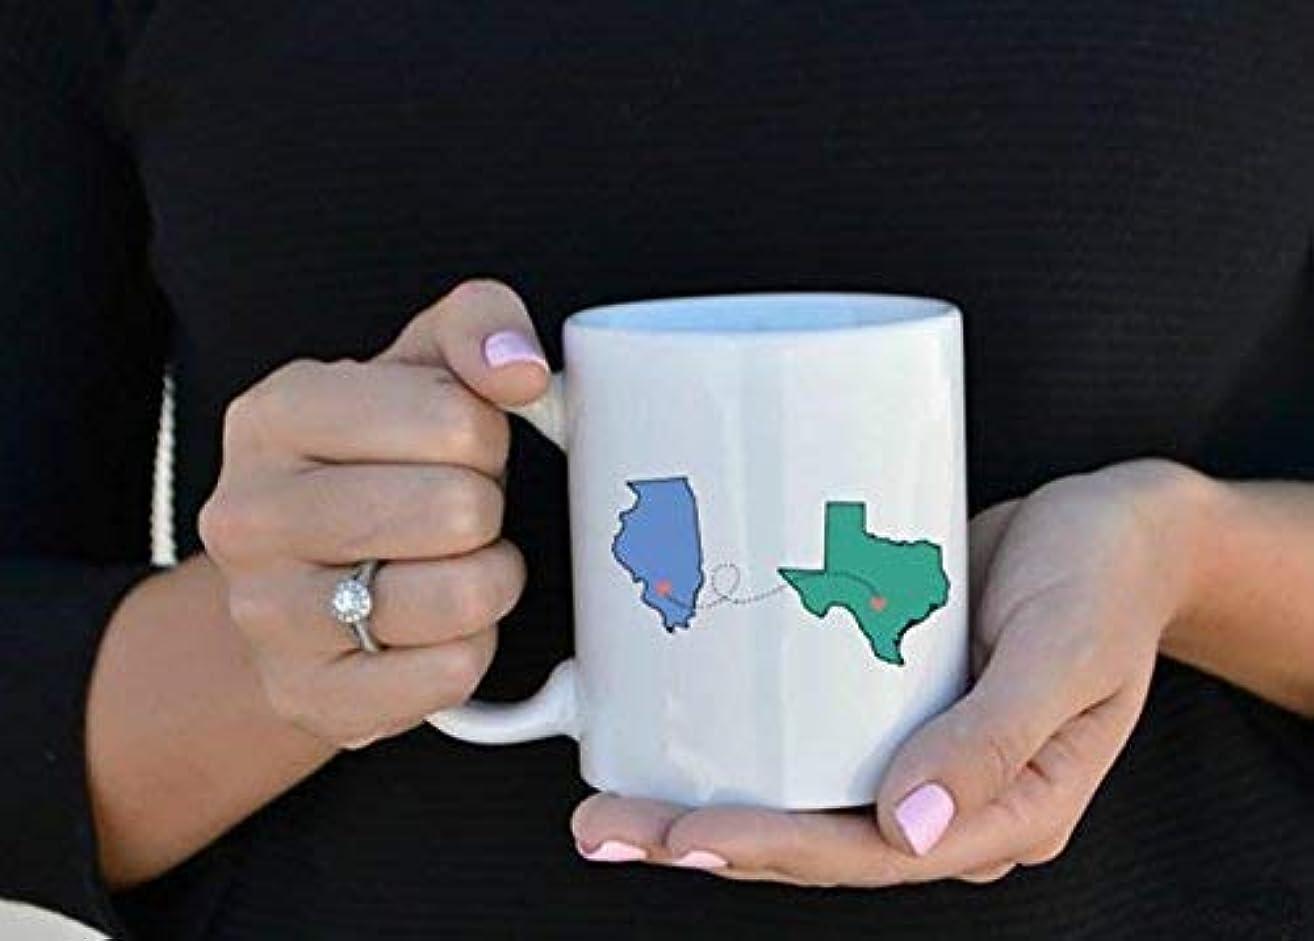 State To State Mug - Coffee Mug - Long Distance Mug - State Mug - Best Friend Mugs - Country To Country Mugs - Long Distance Gift - Going Away Gift